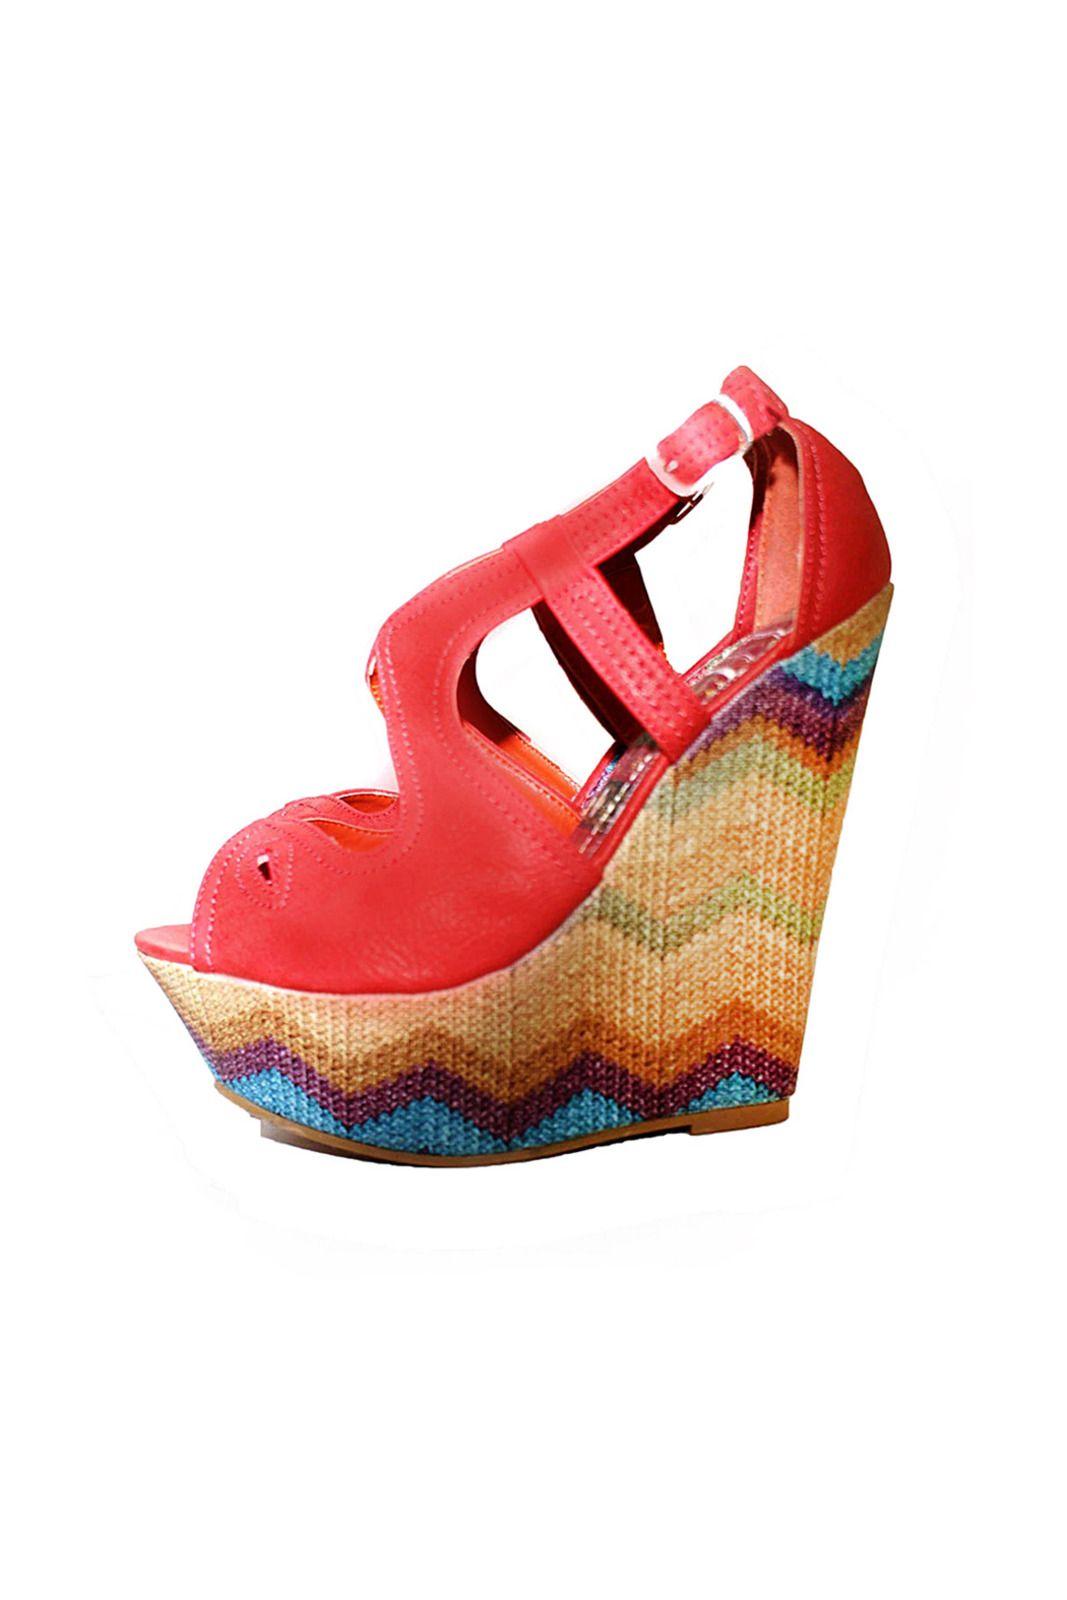 a83cc326c061 Zigzag Platform Wedge Sandals